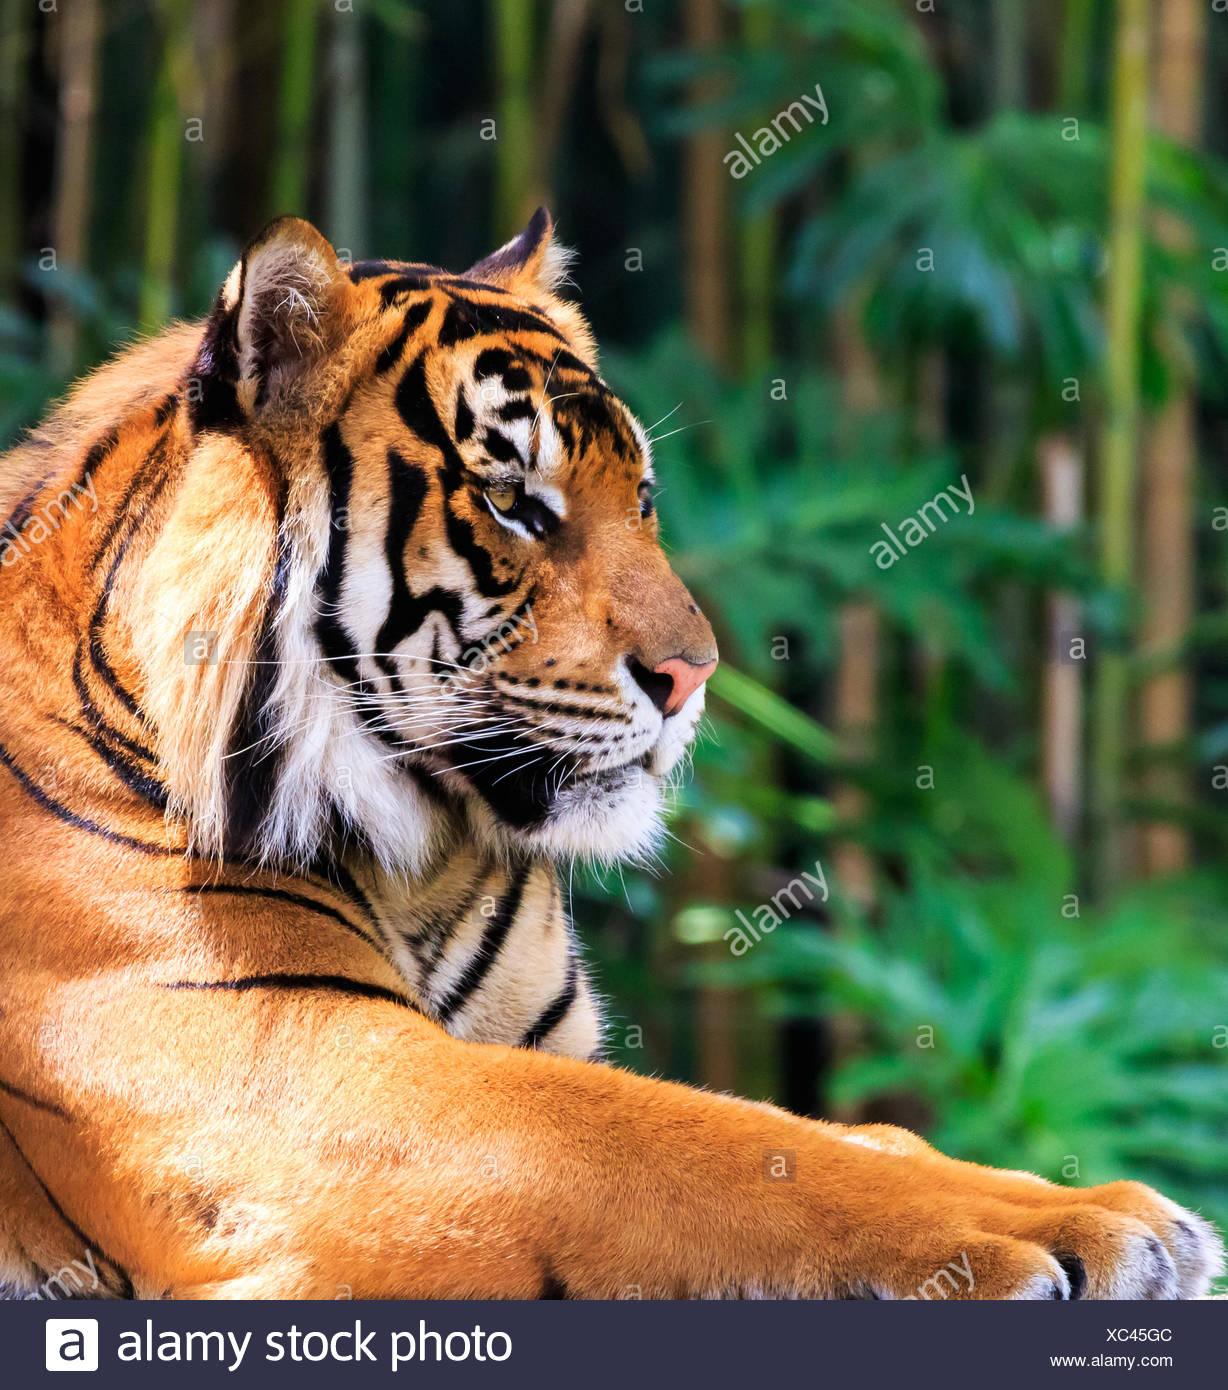 Regal Tiger - Stock Image